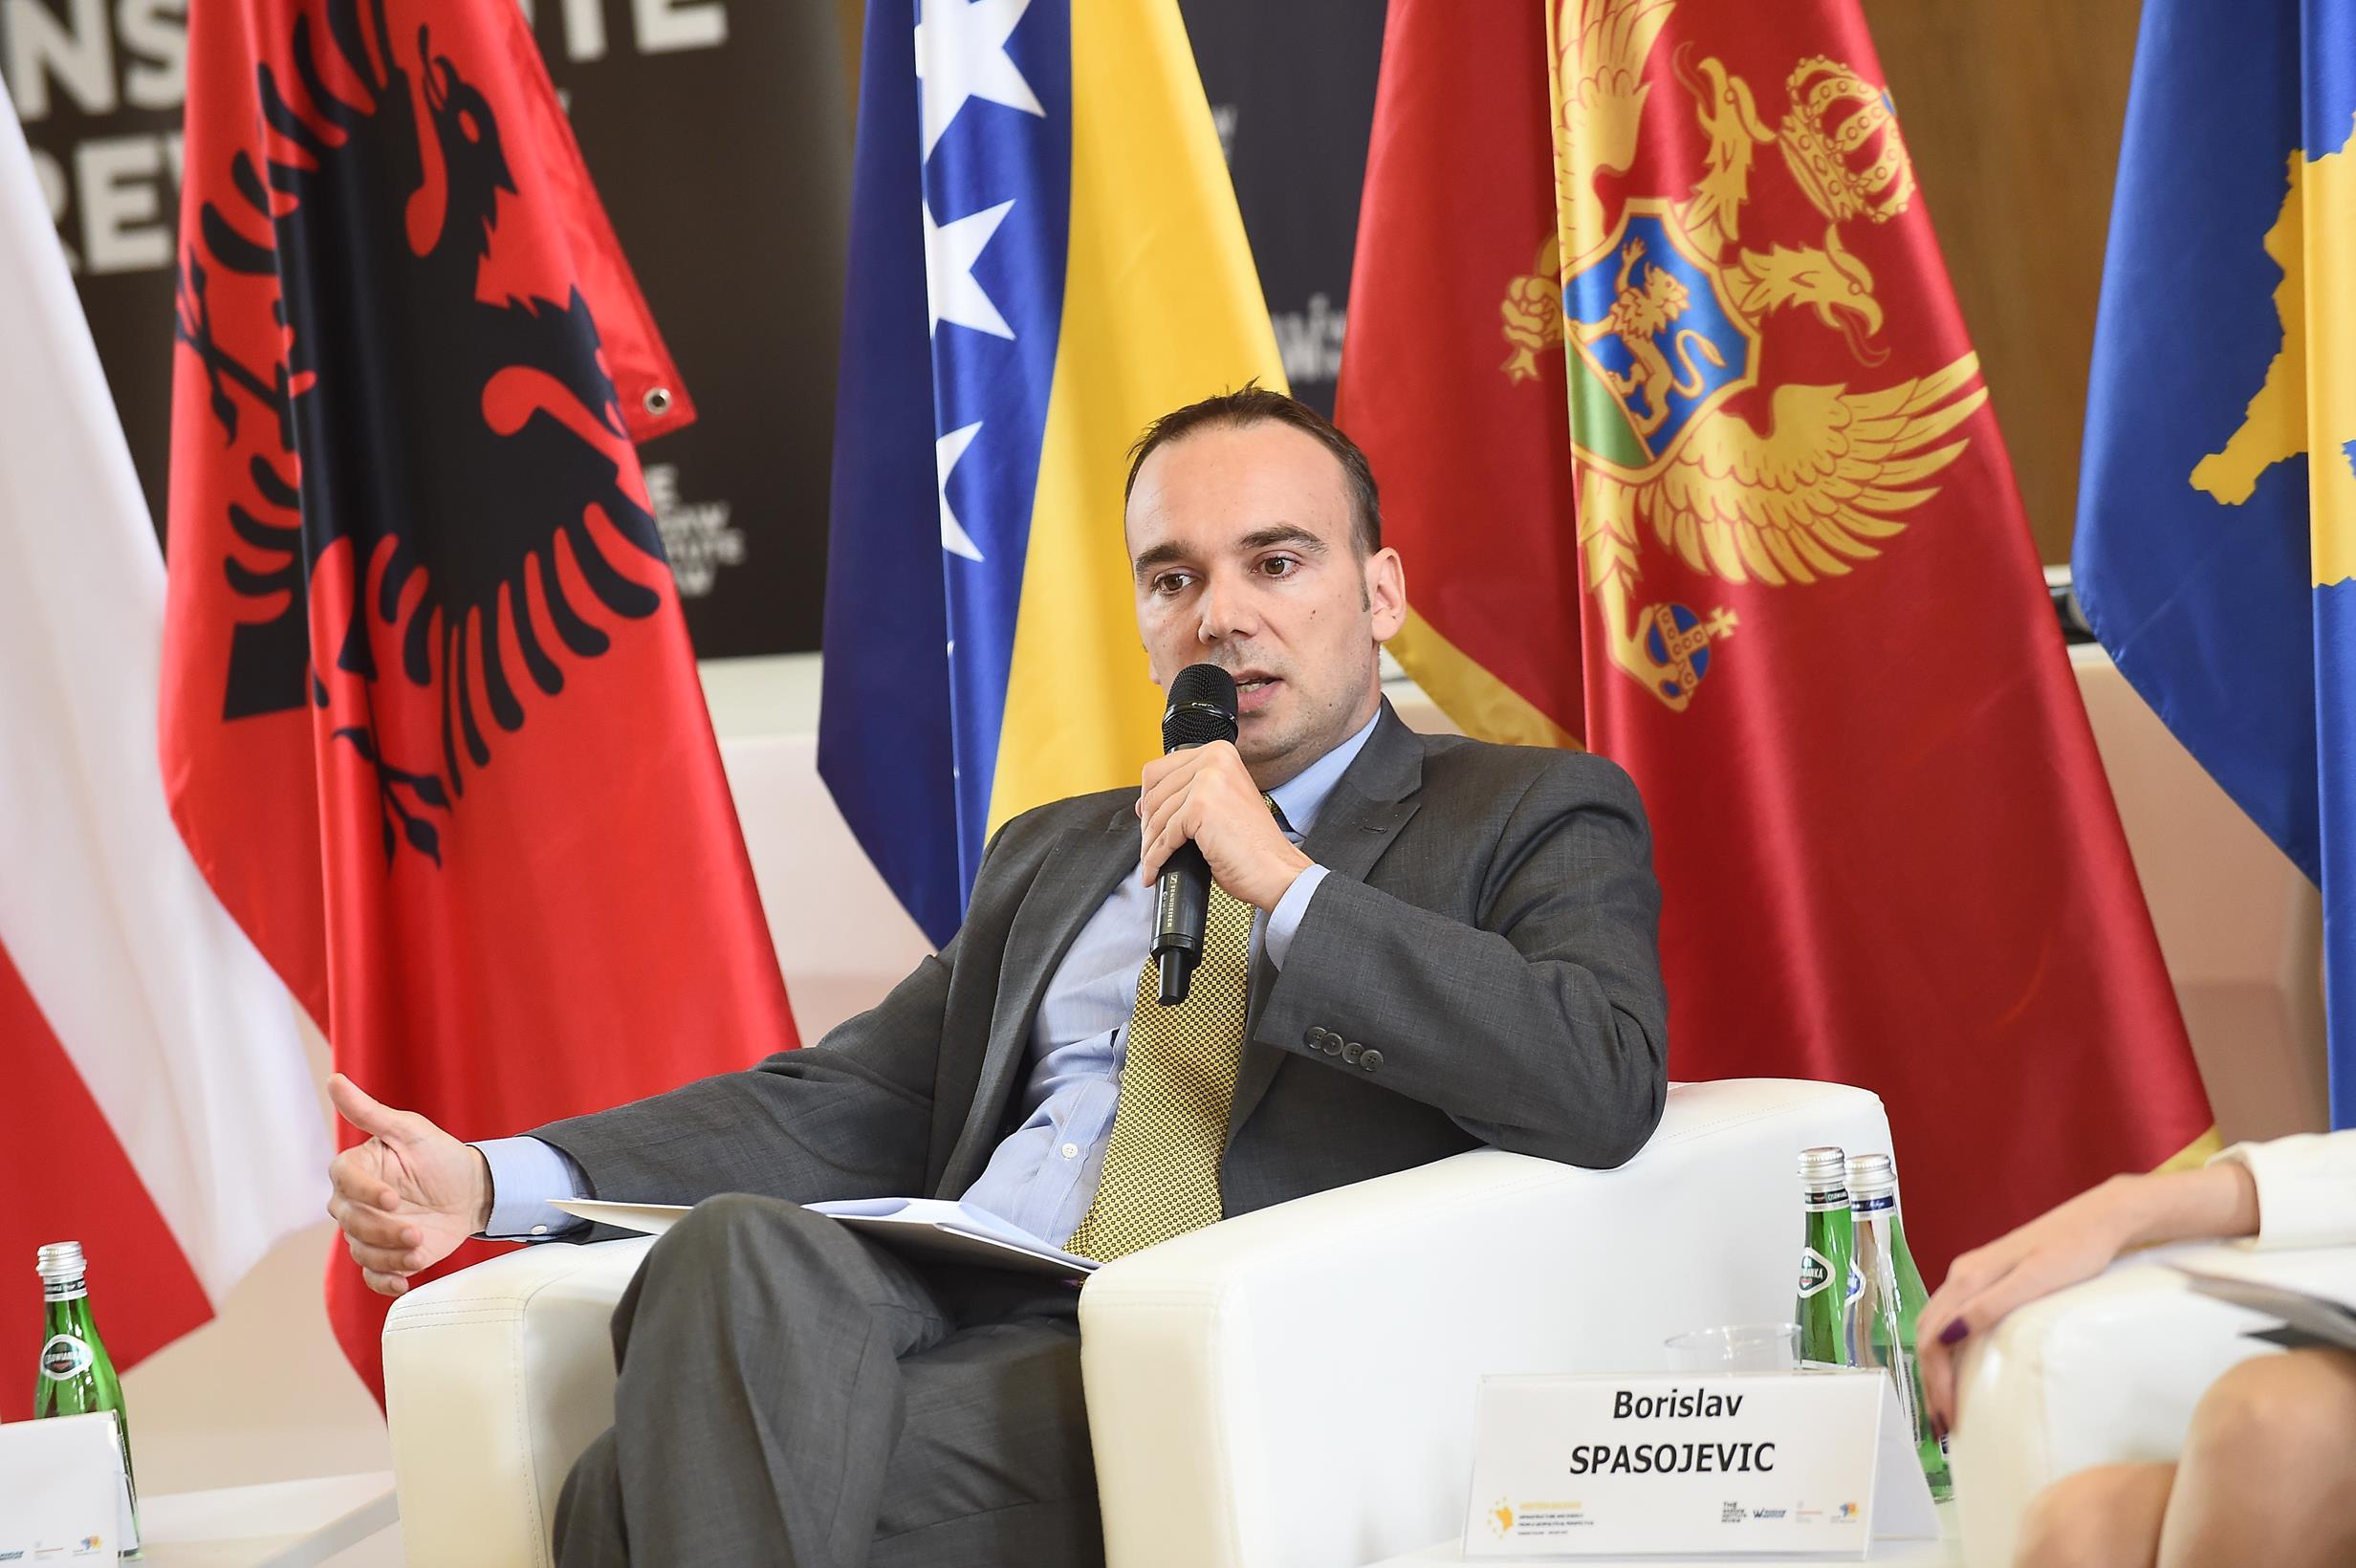 Borislav Spasojevic western balkans geopolitics warsaw institute k6 5